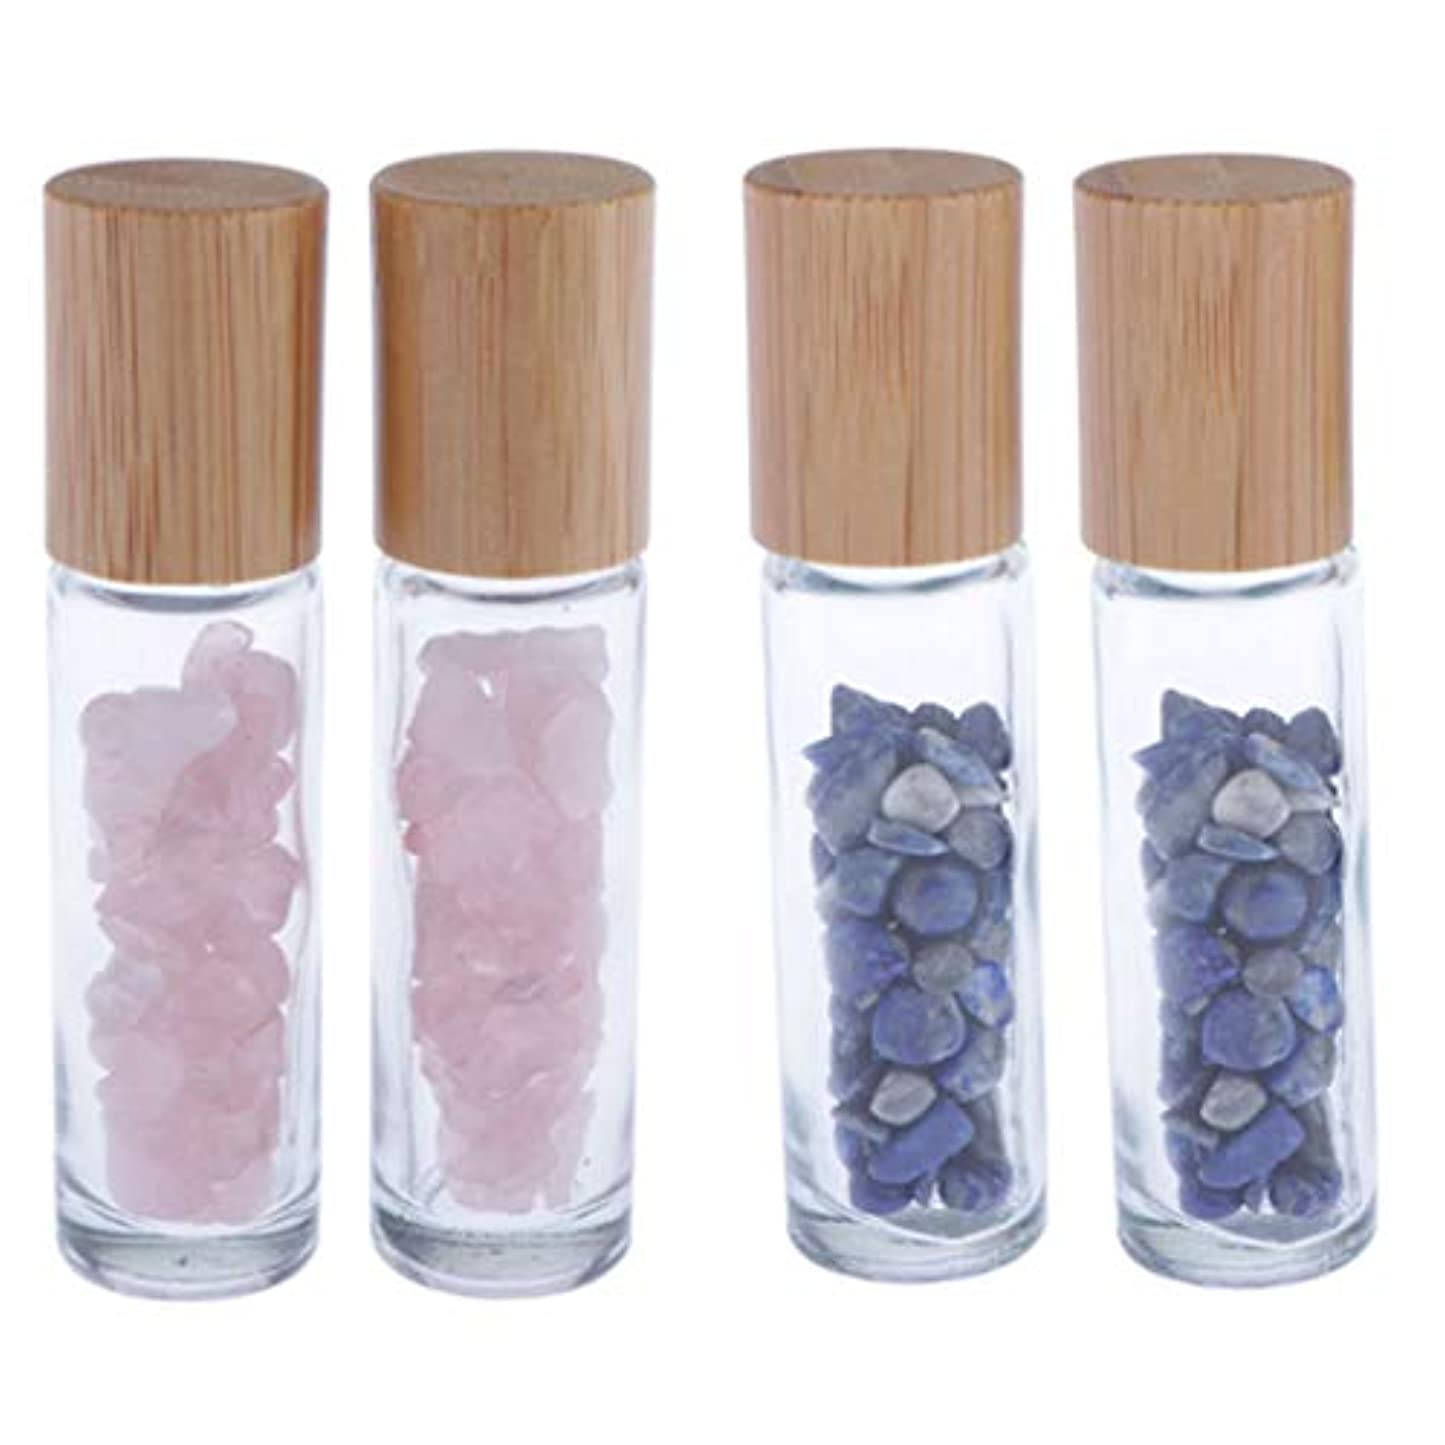 chiwanji 香水瓶 ガラス ローラーボールボトル エッセンシャルオイルボトル 香水瓶 4個入り